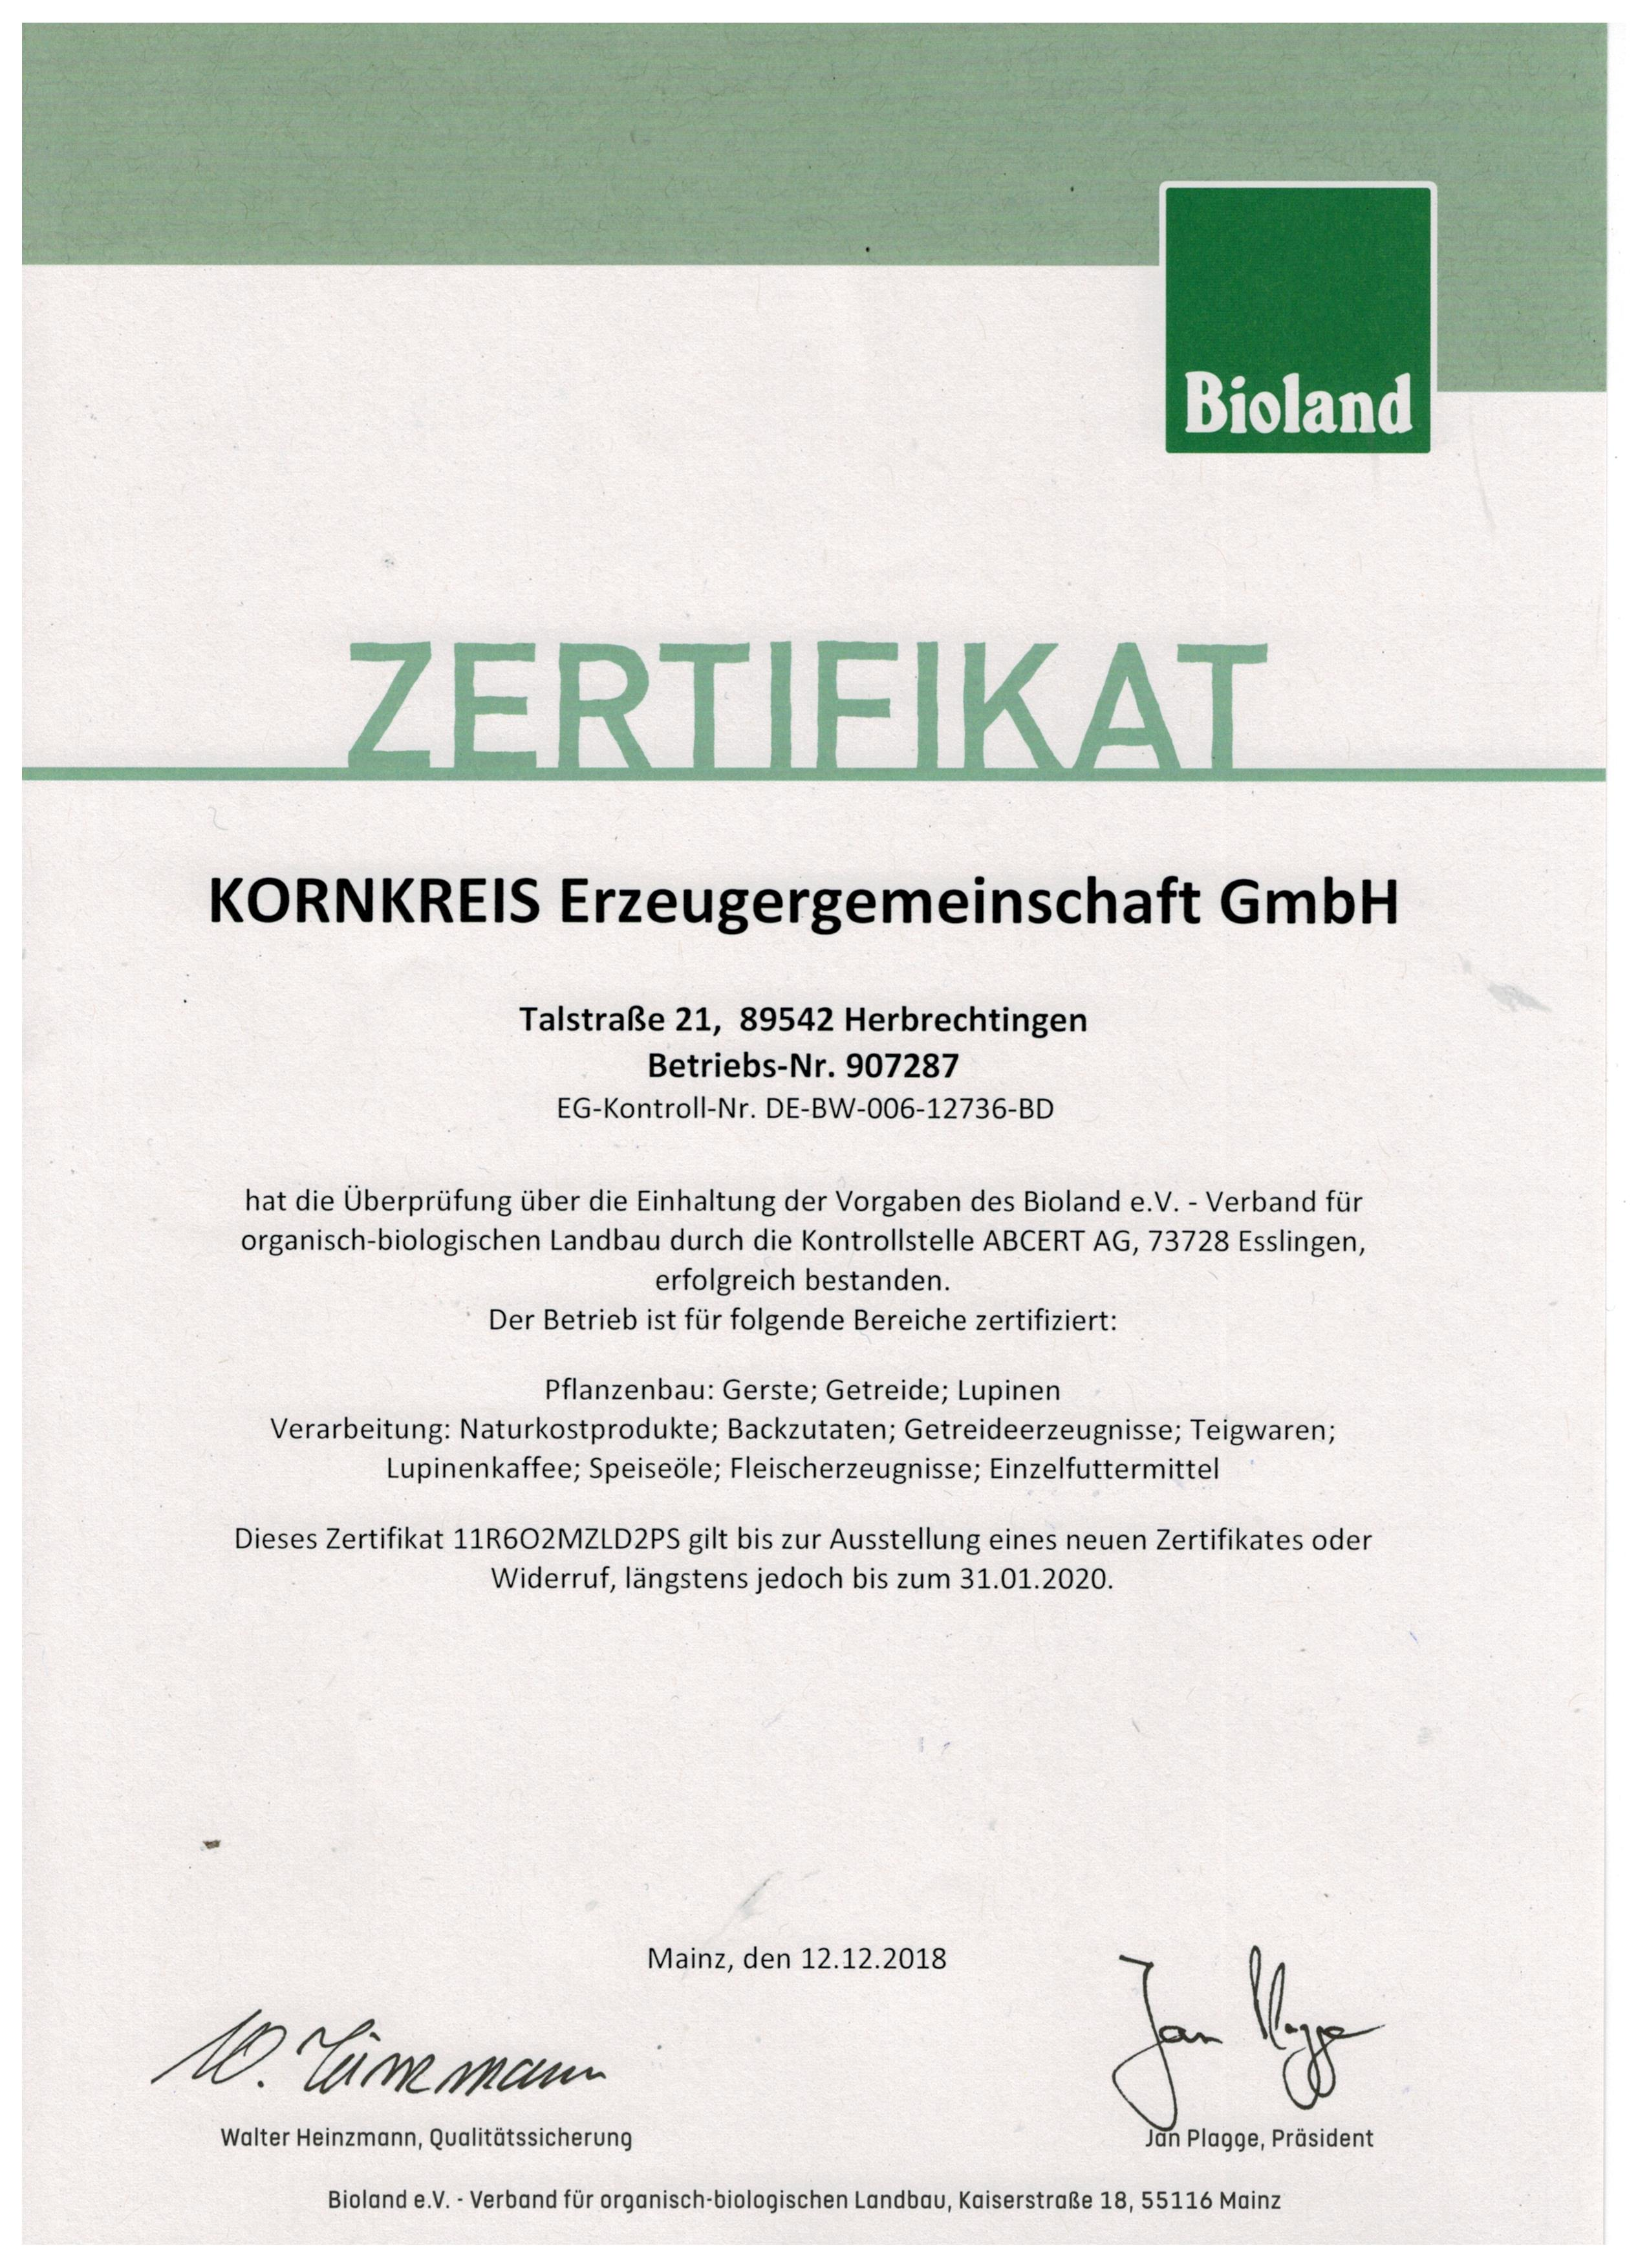 Bioland-Zertifikat bis 31.01.2020